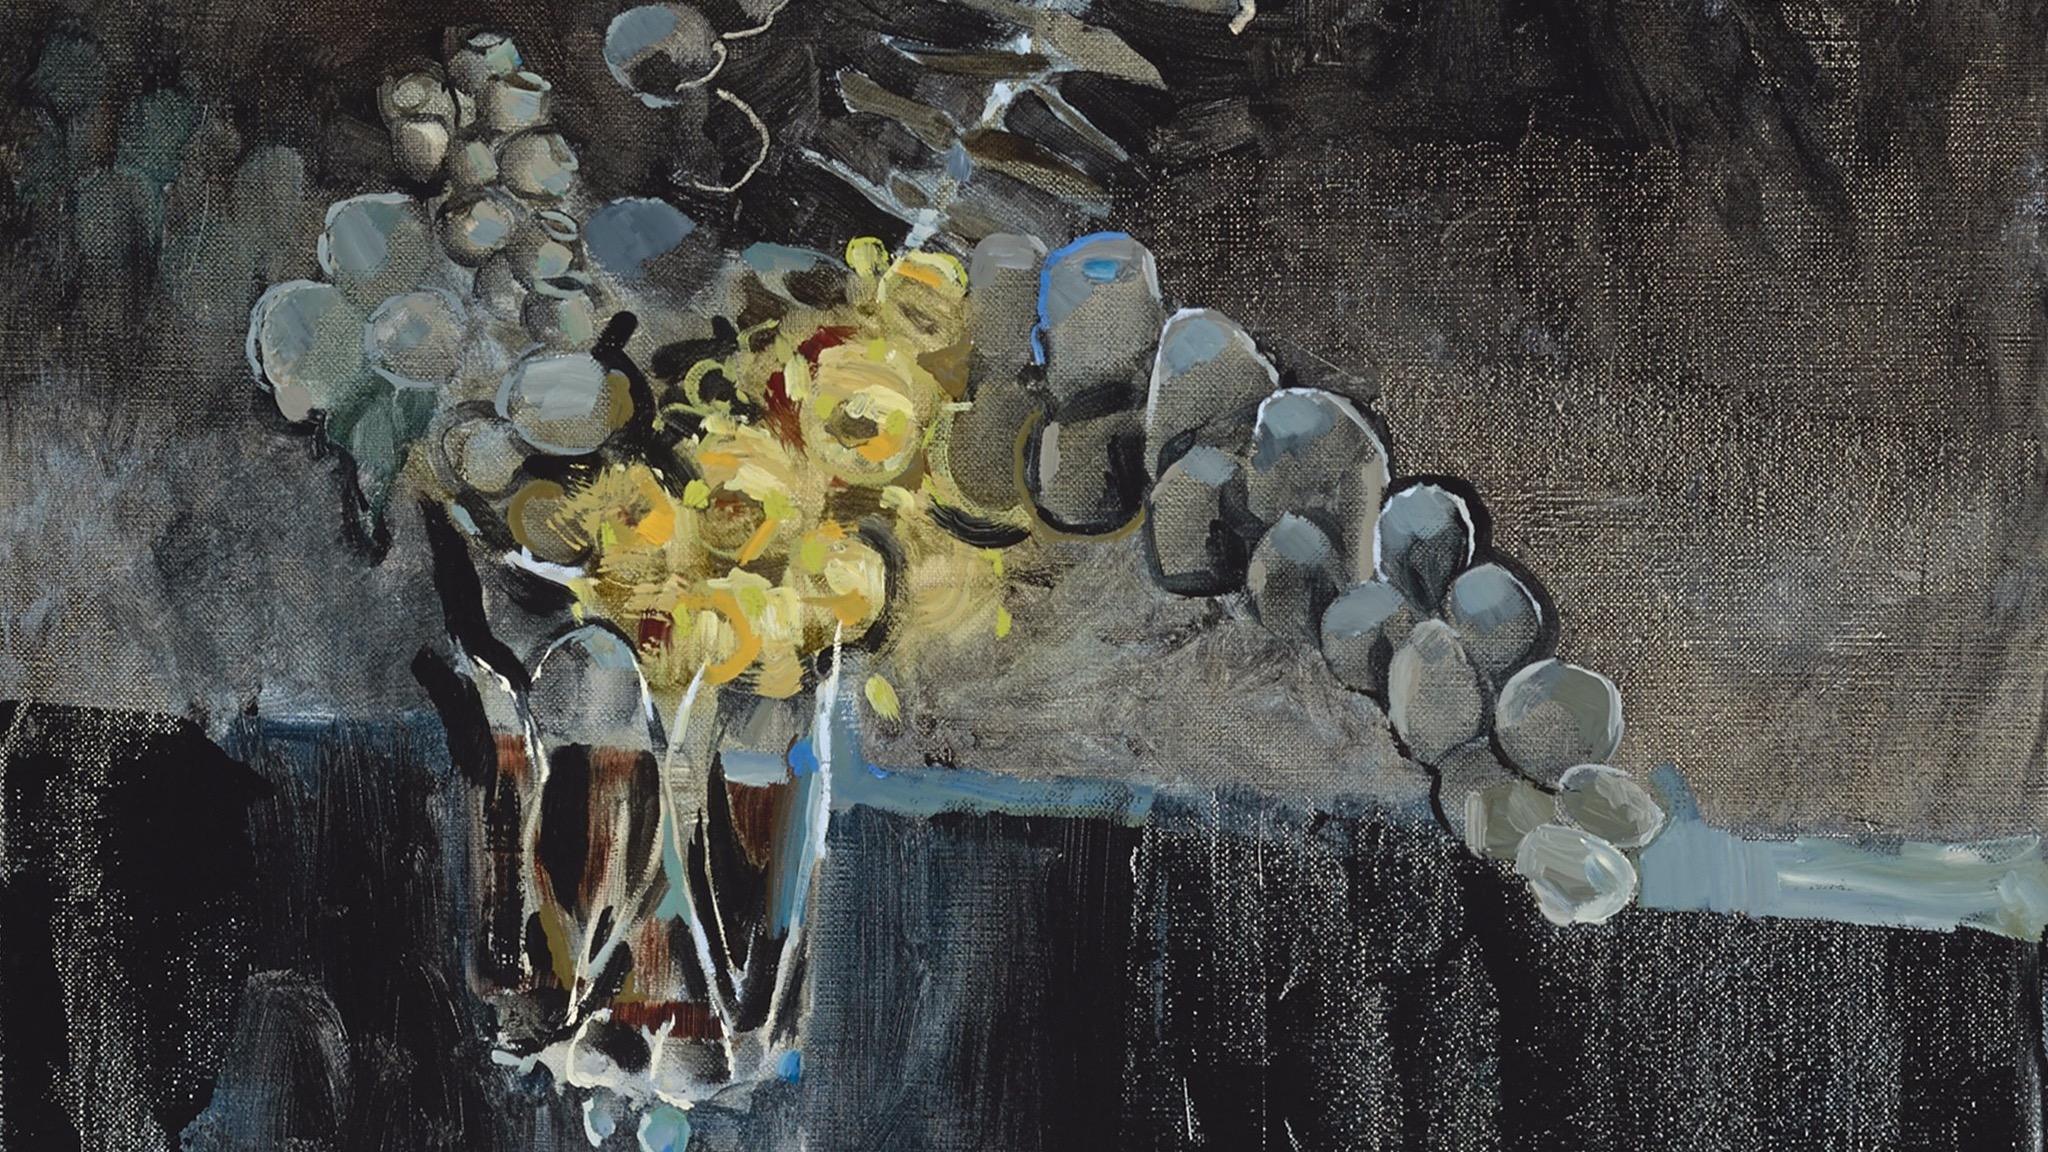 Adam Pyett 'Flowering gum' (detail)  2013,  oil on linen,  Private collection.